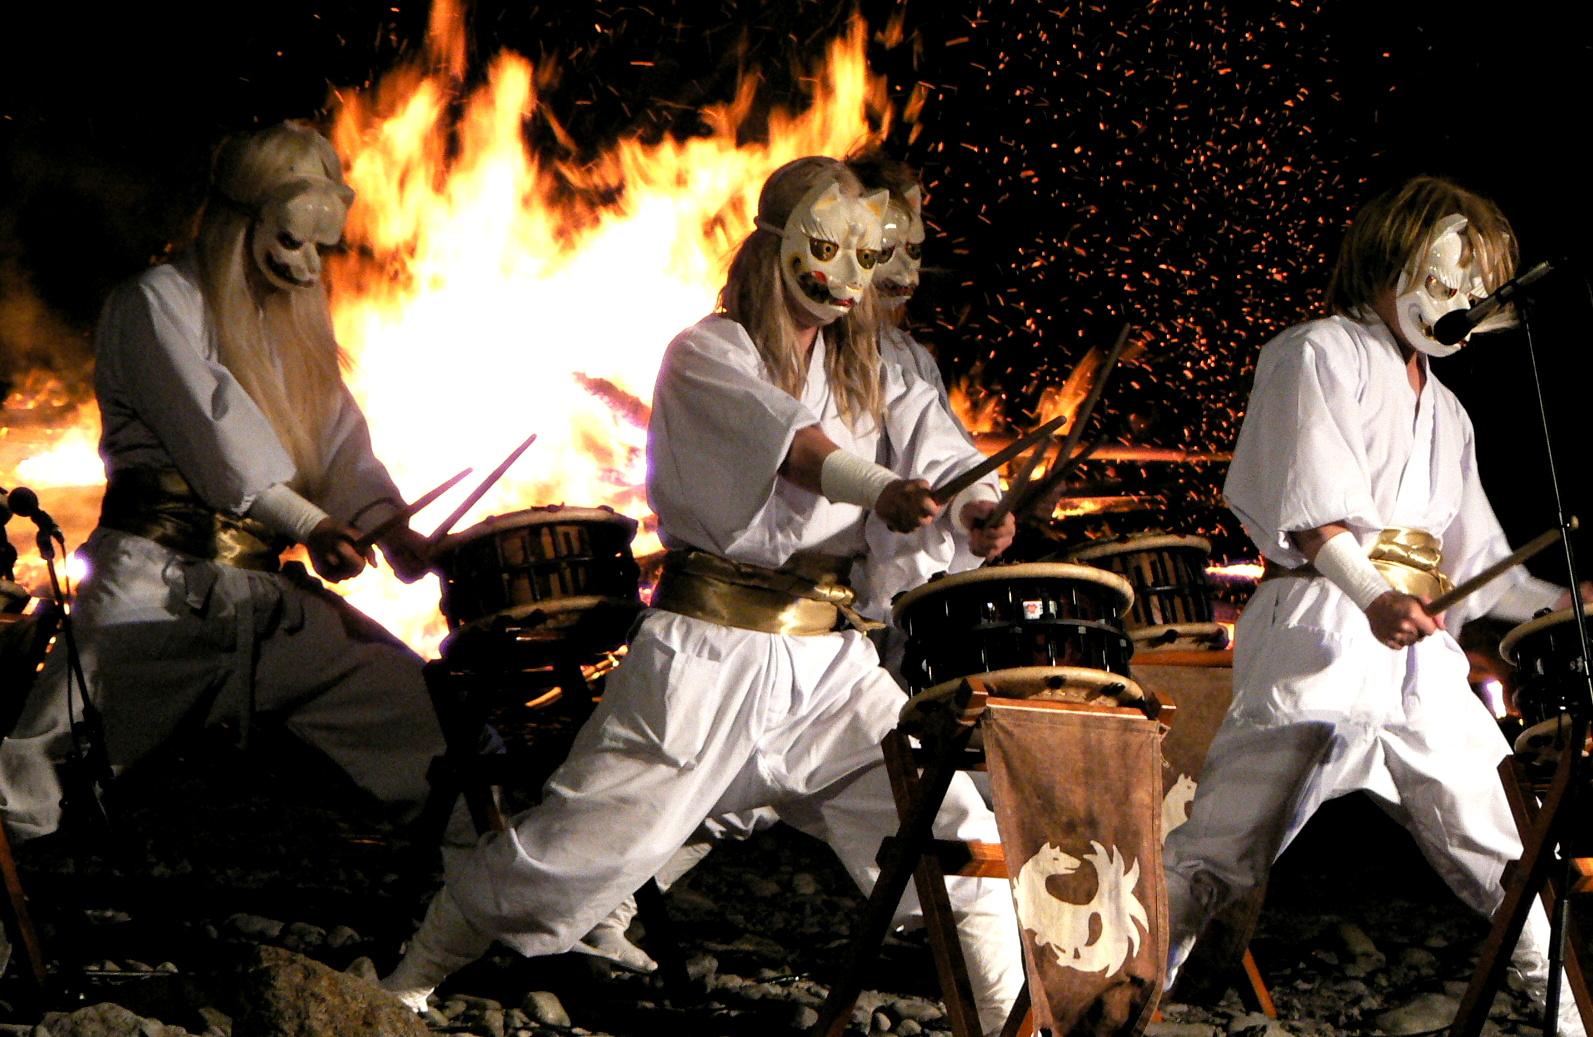 那須殺生石御神火祭の白面金毛九尾狐太鼓の幻想的な世界